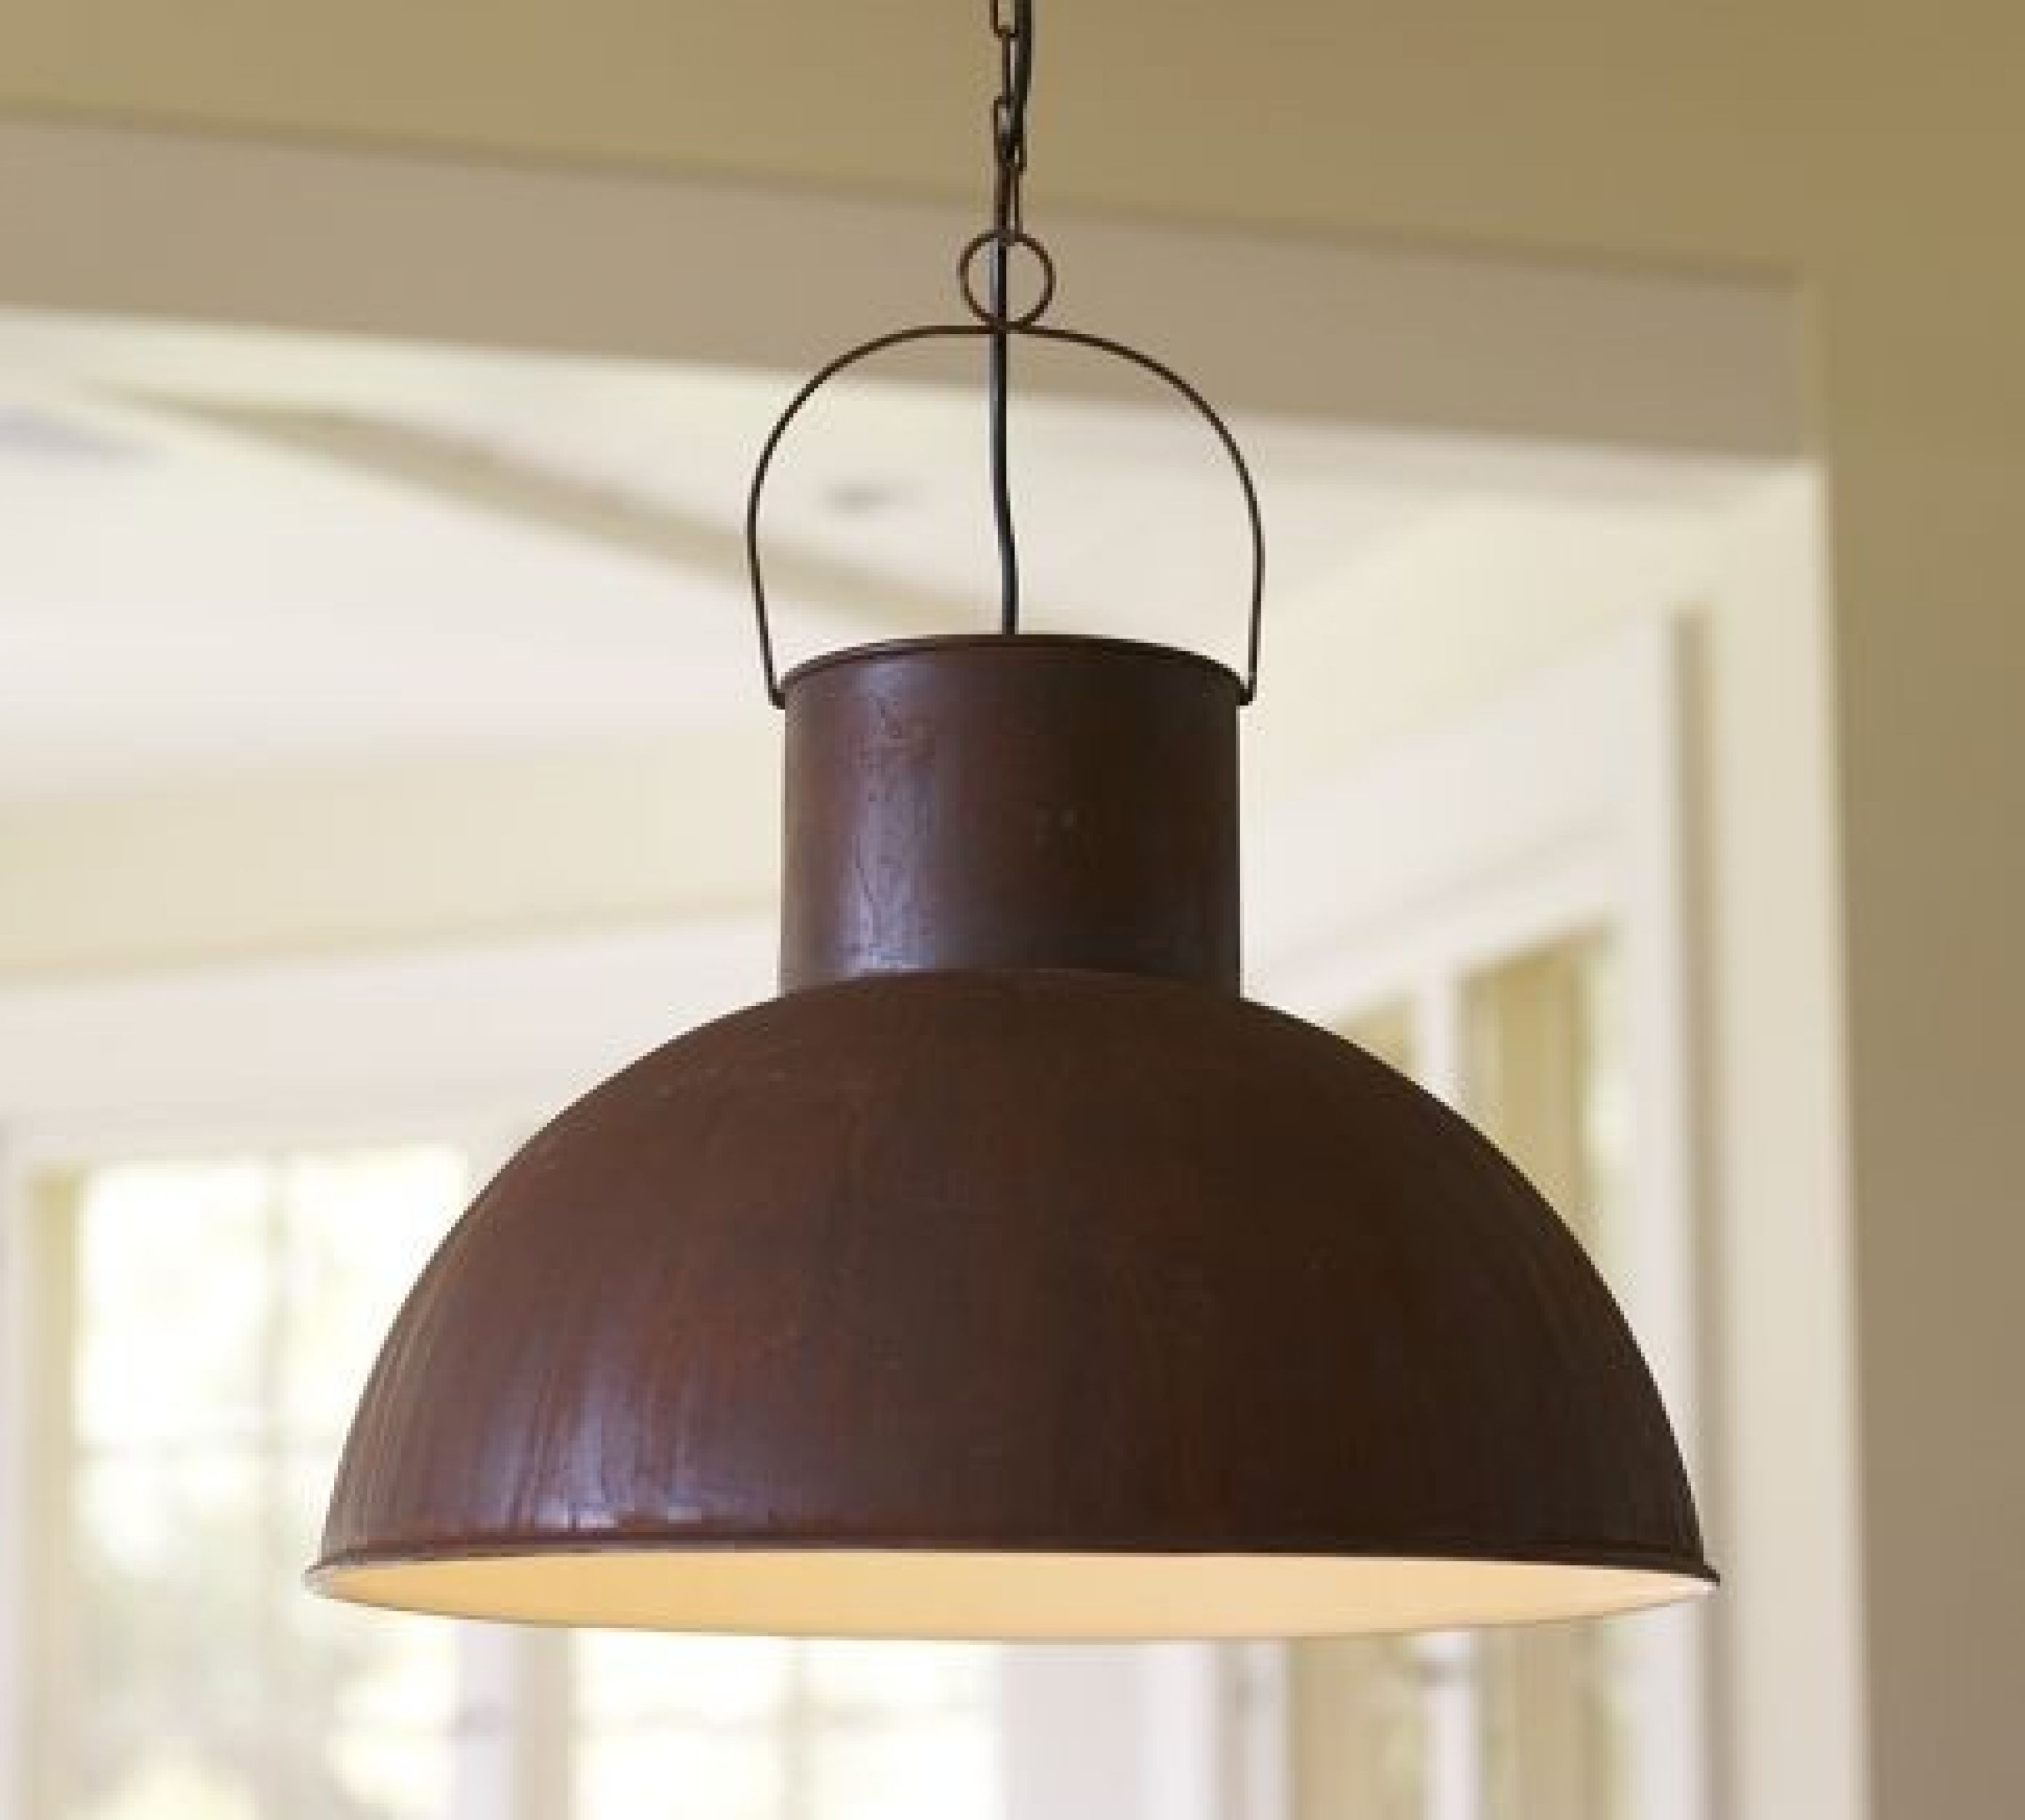 Enchanting pottery barn pendant lights houzz and also barn pendant